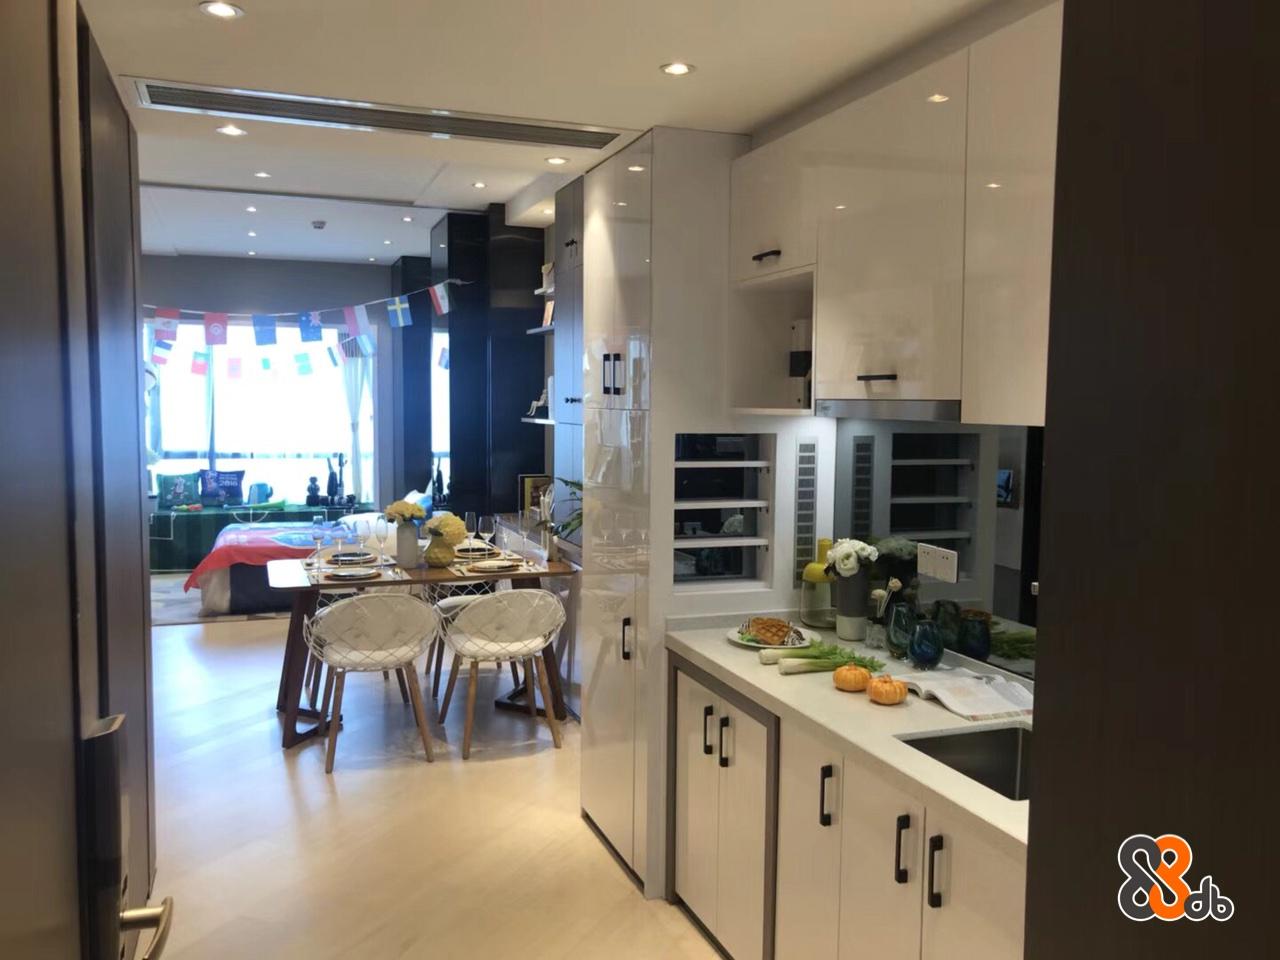 interior design,kitchen,countertop